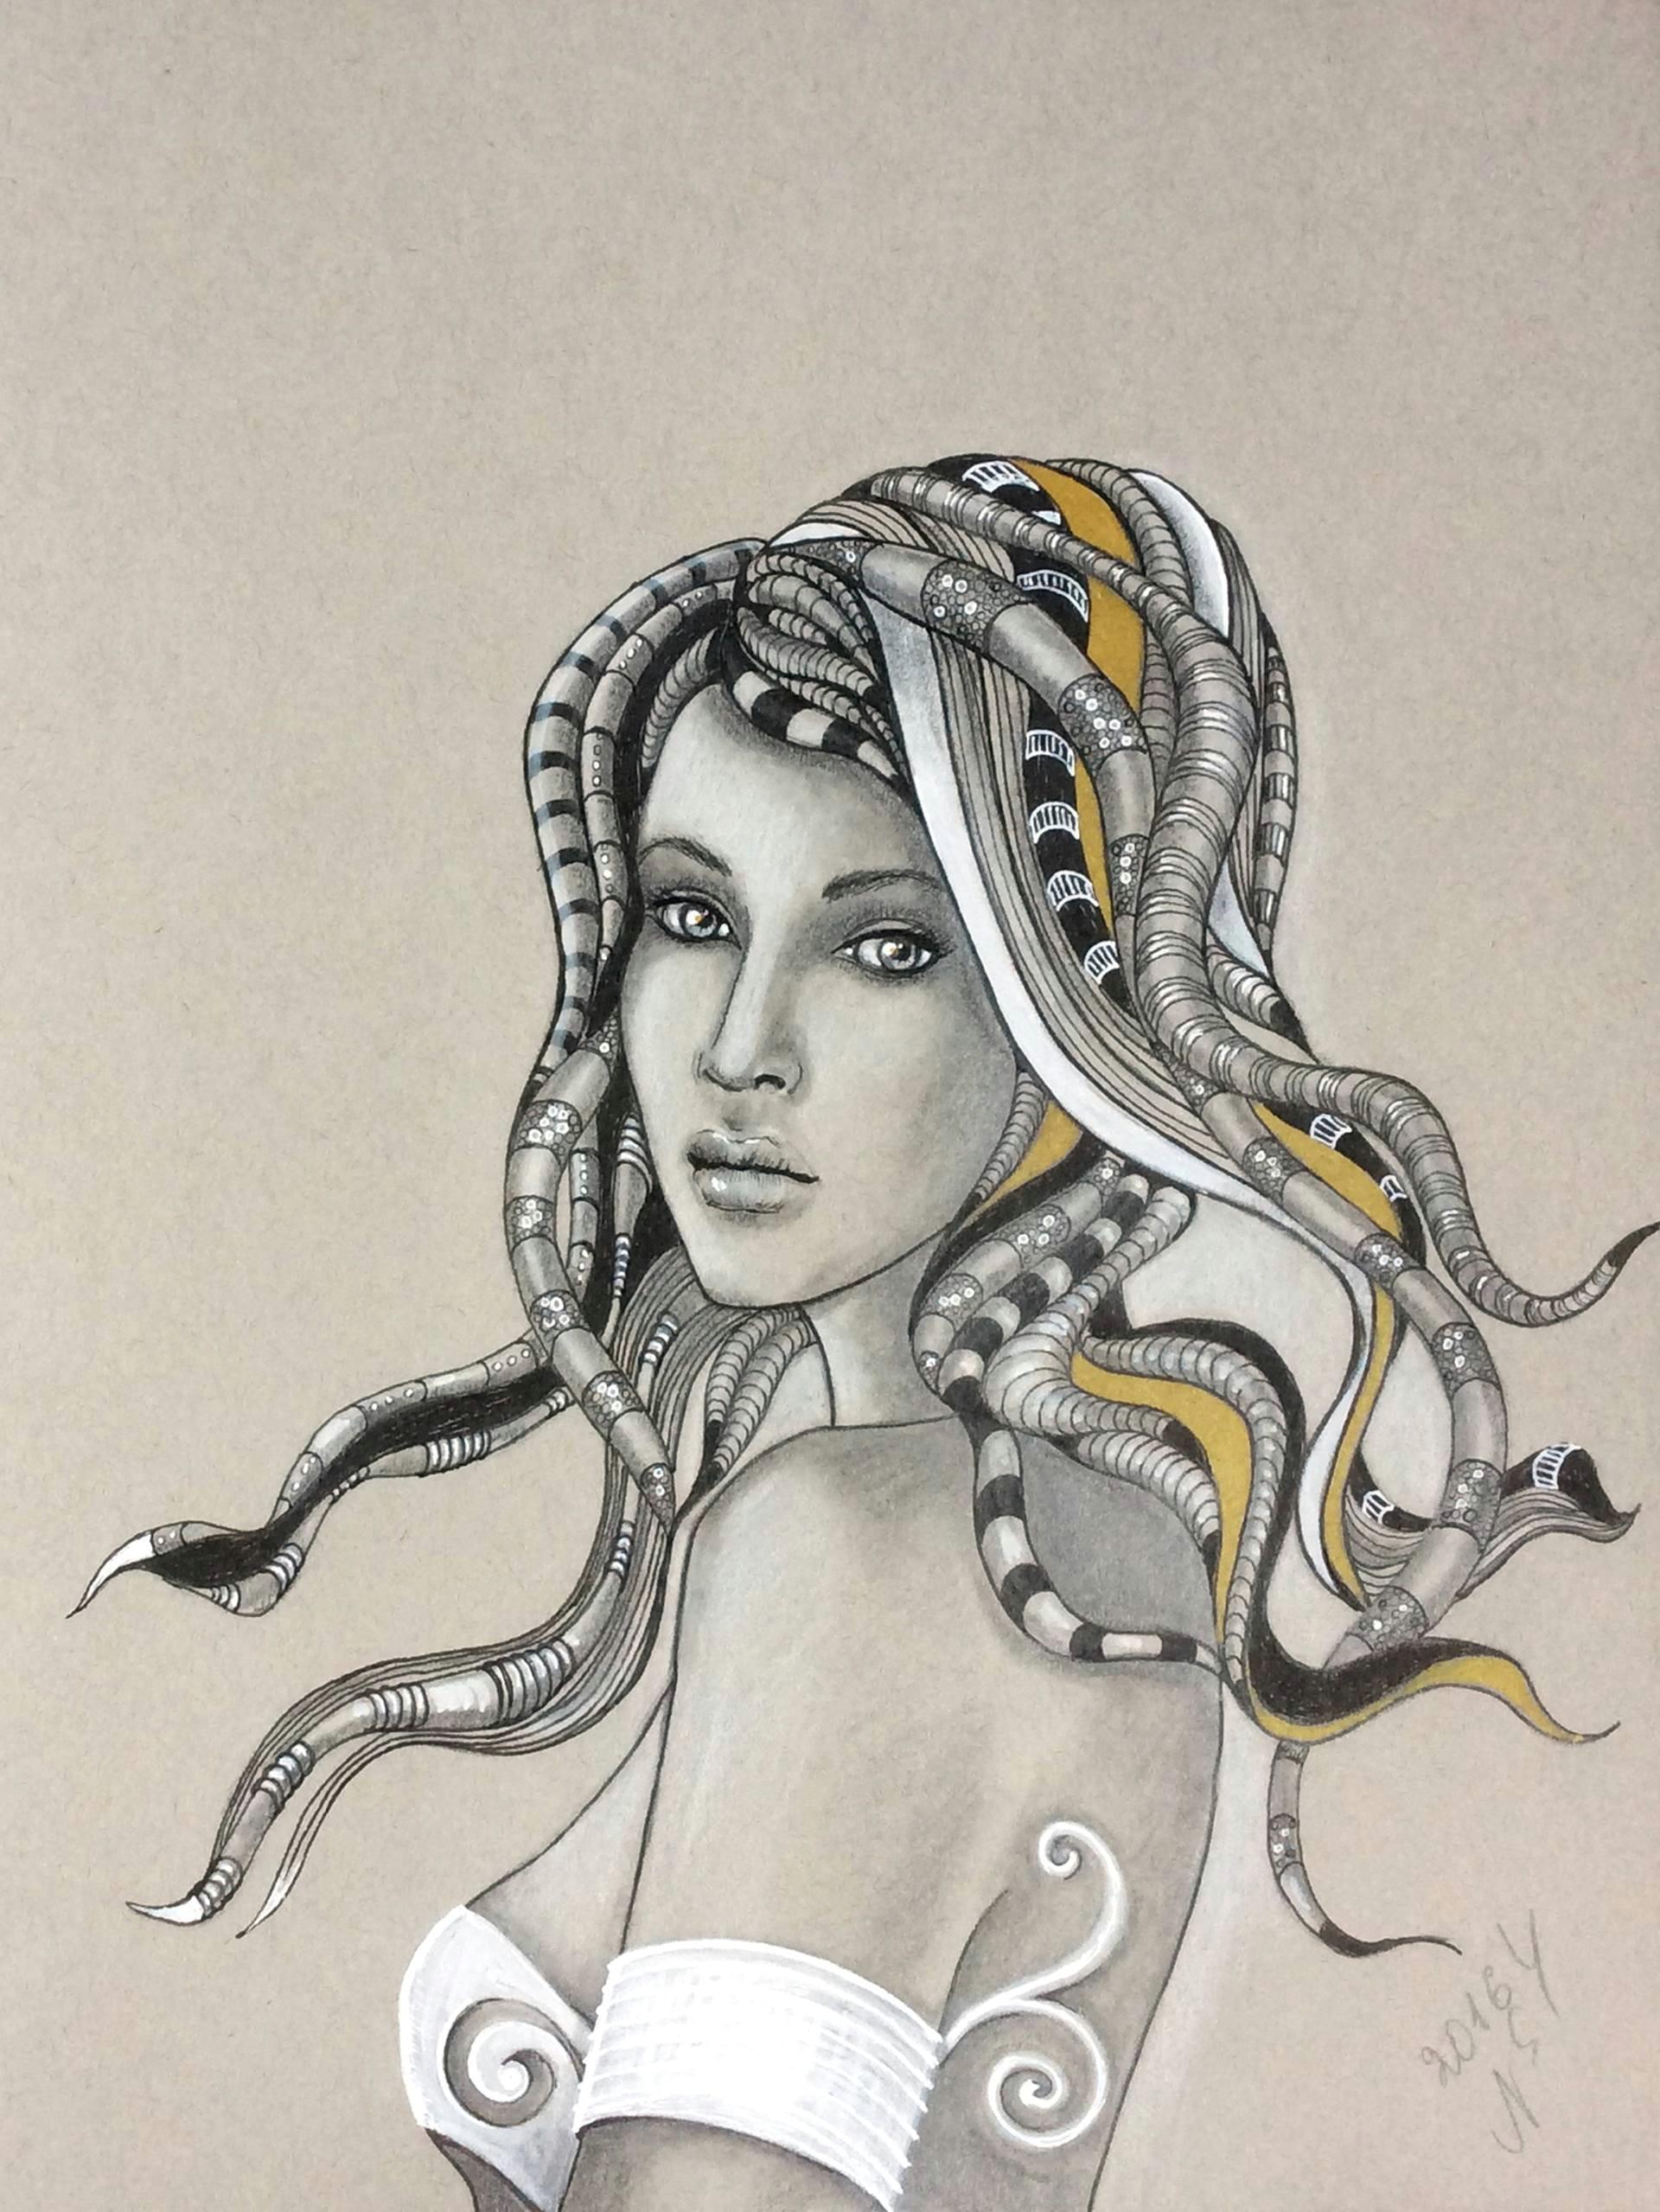 hairstyle drawing by natalya simonova